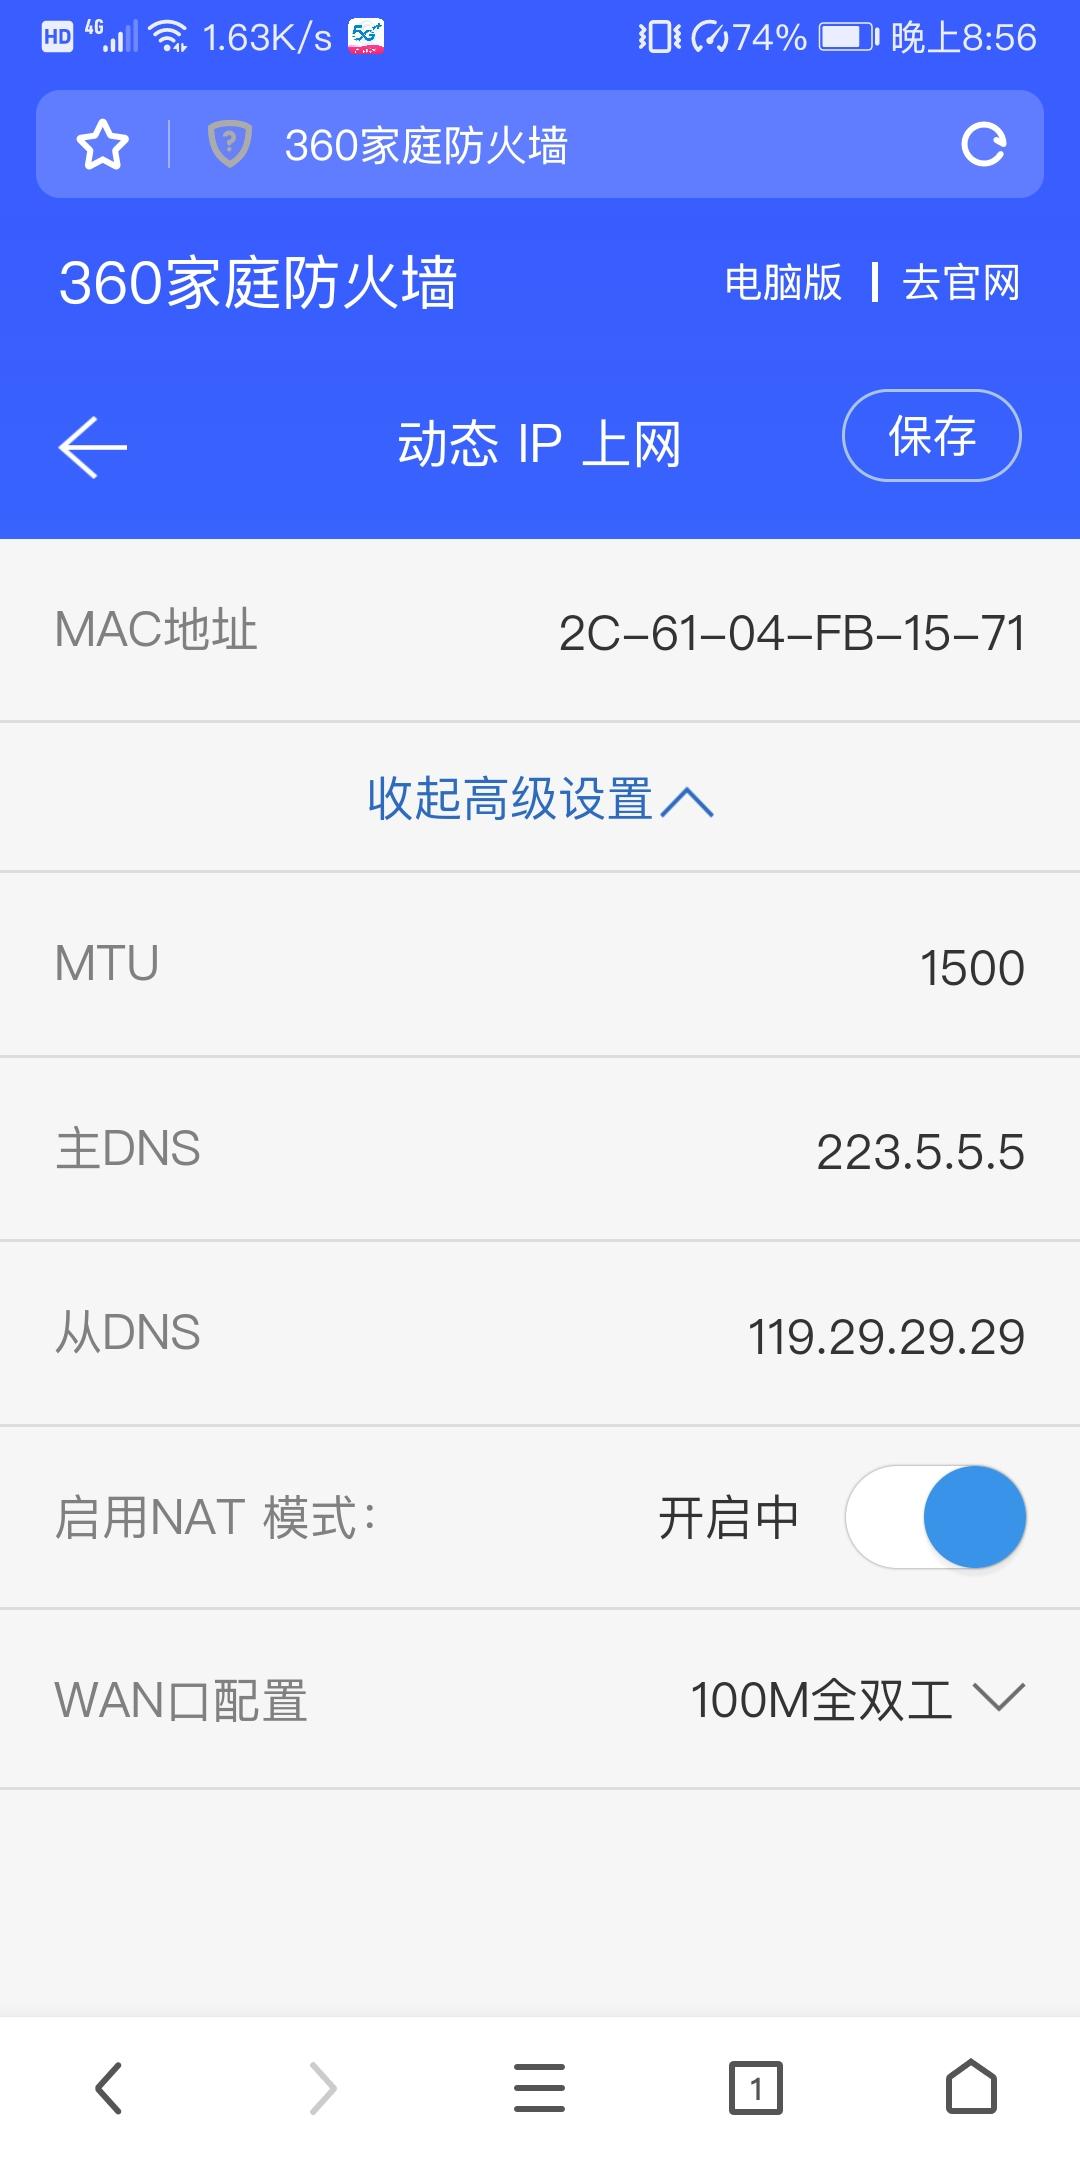 Screenshot_20200213_205653_com.qihoo.contents.jpg